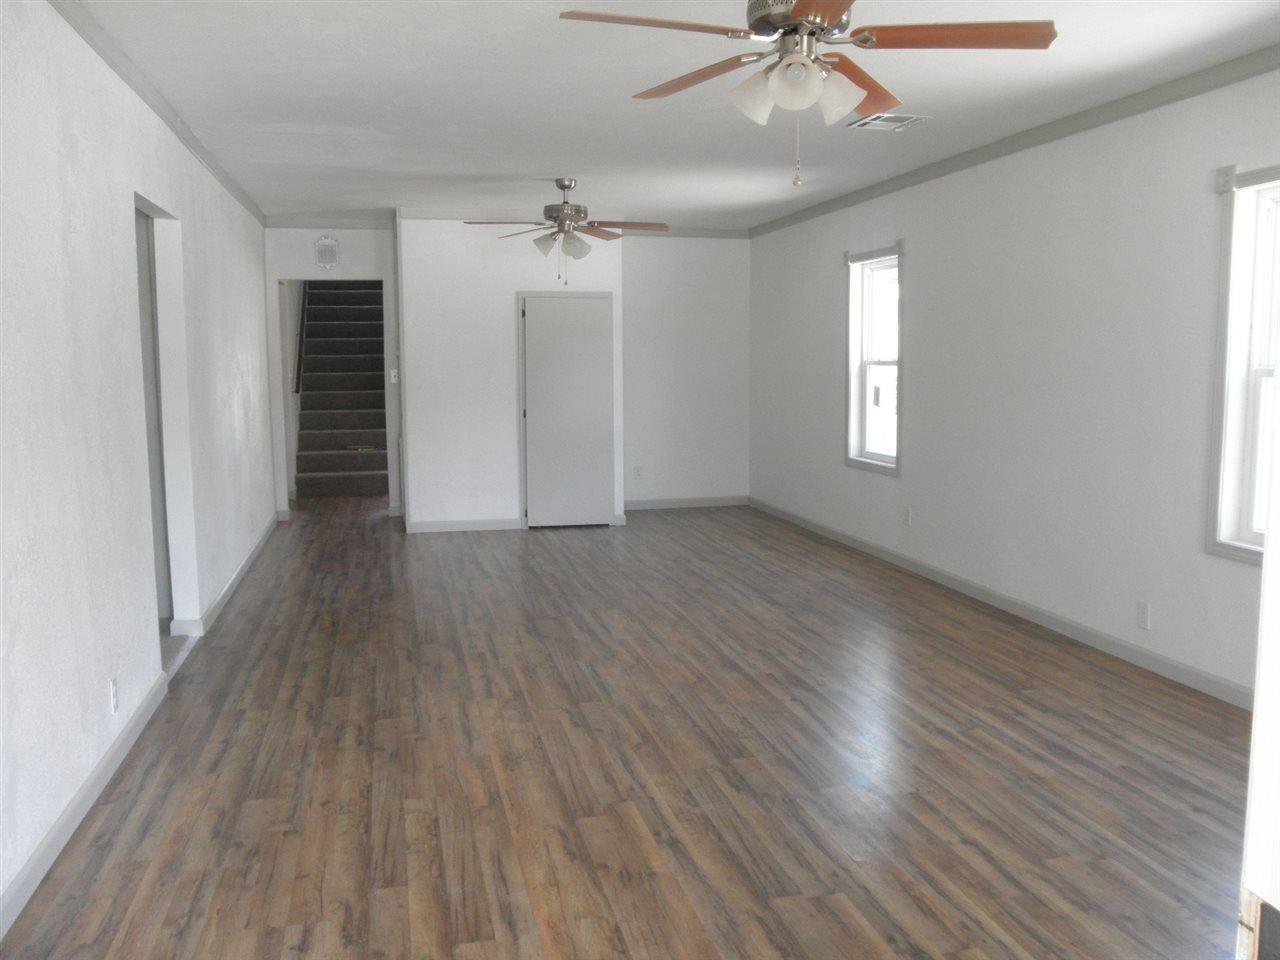 Sold Cross Sale W/ MLS | 189 Tapp Road  Ponca City, OK 74604 3